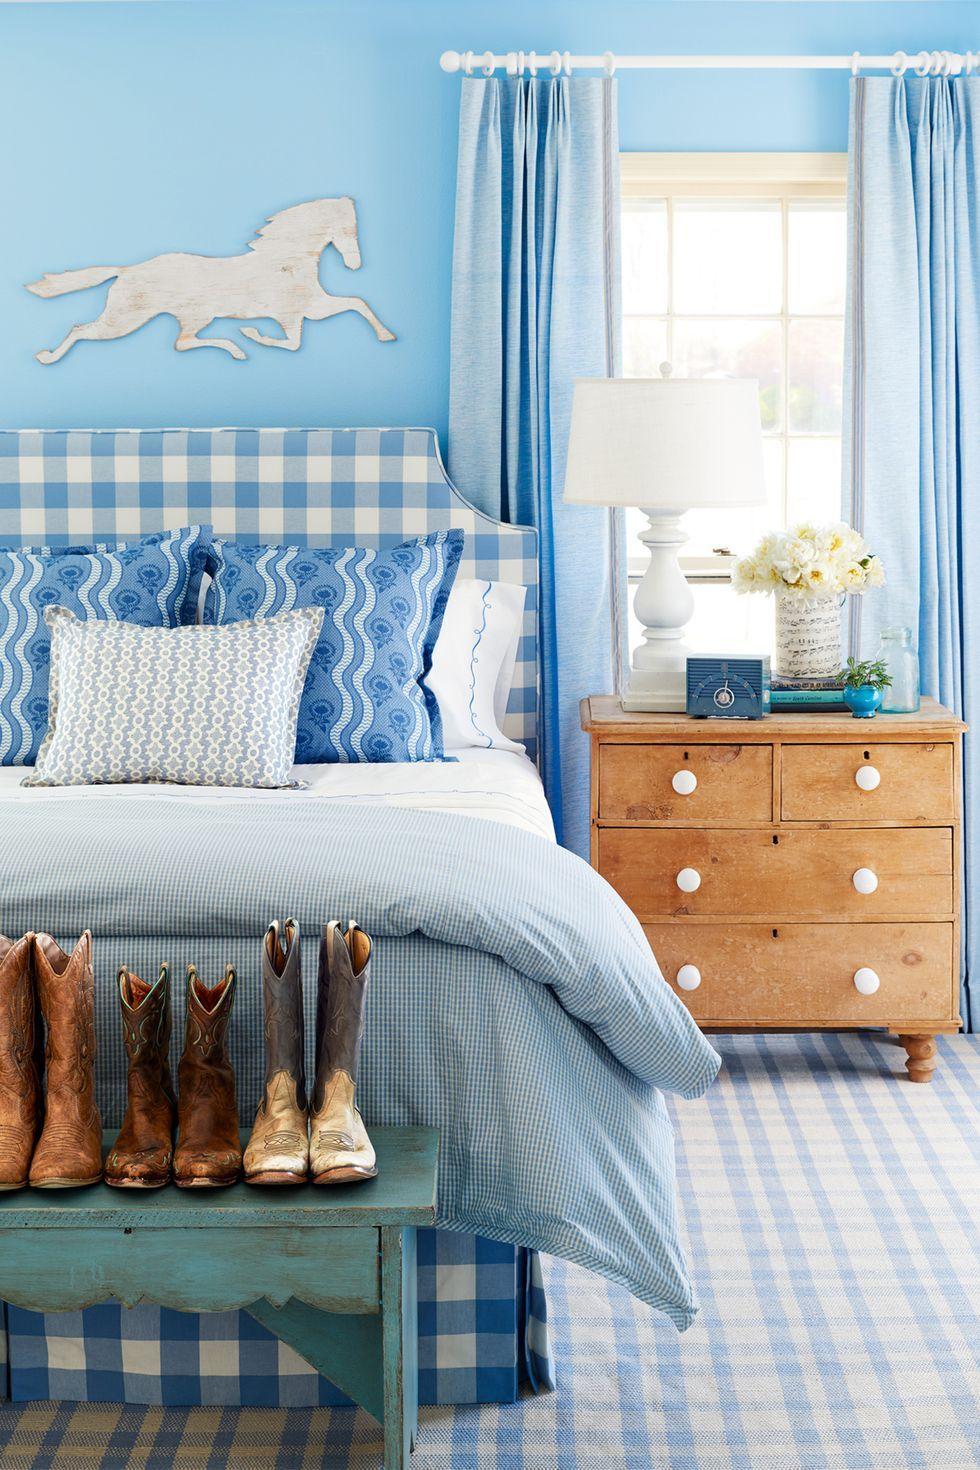 teen bedroom ideas - country theme